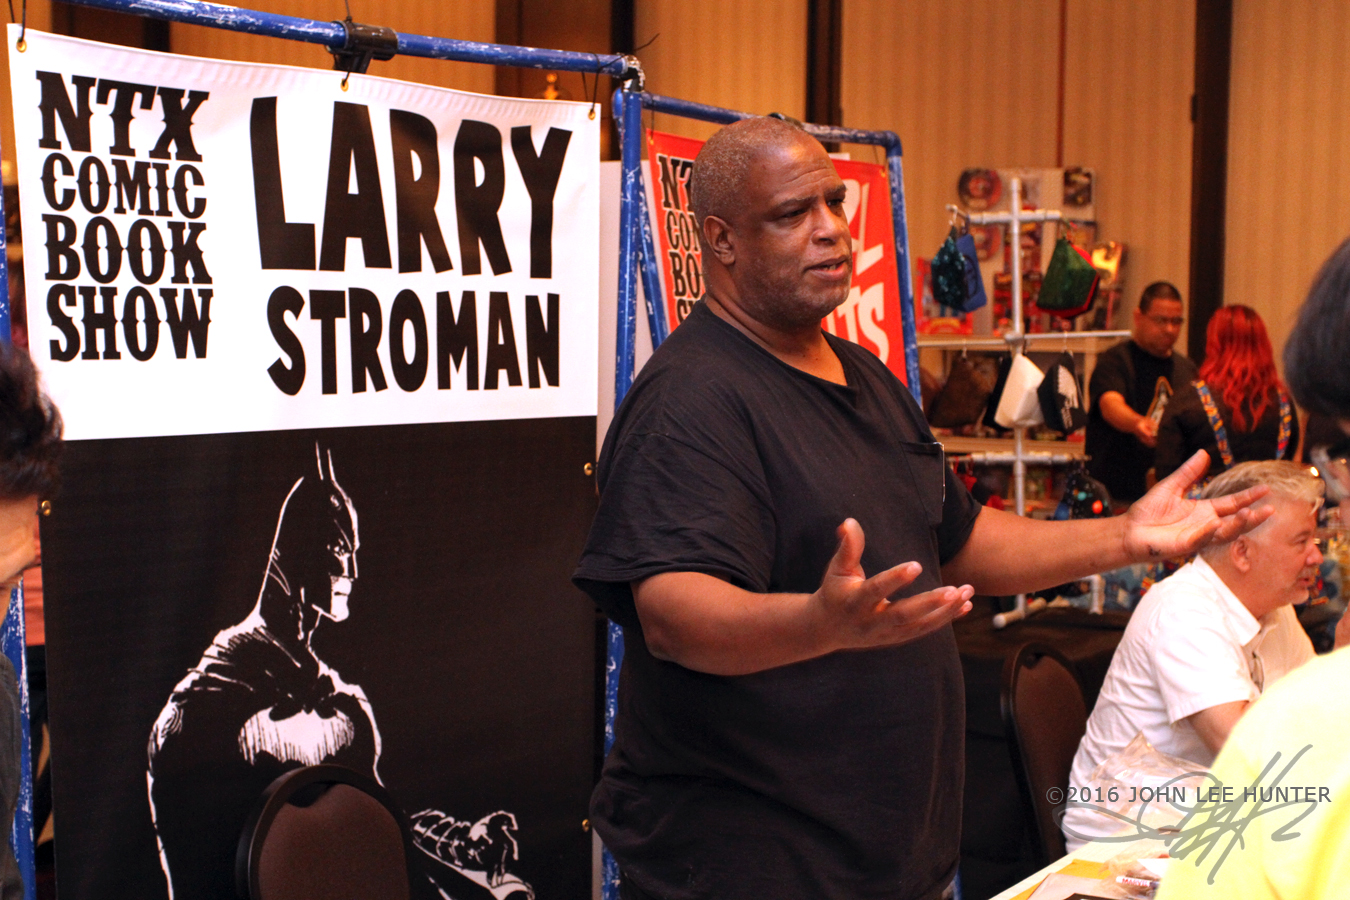 Larry Stroman